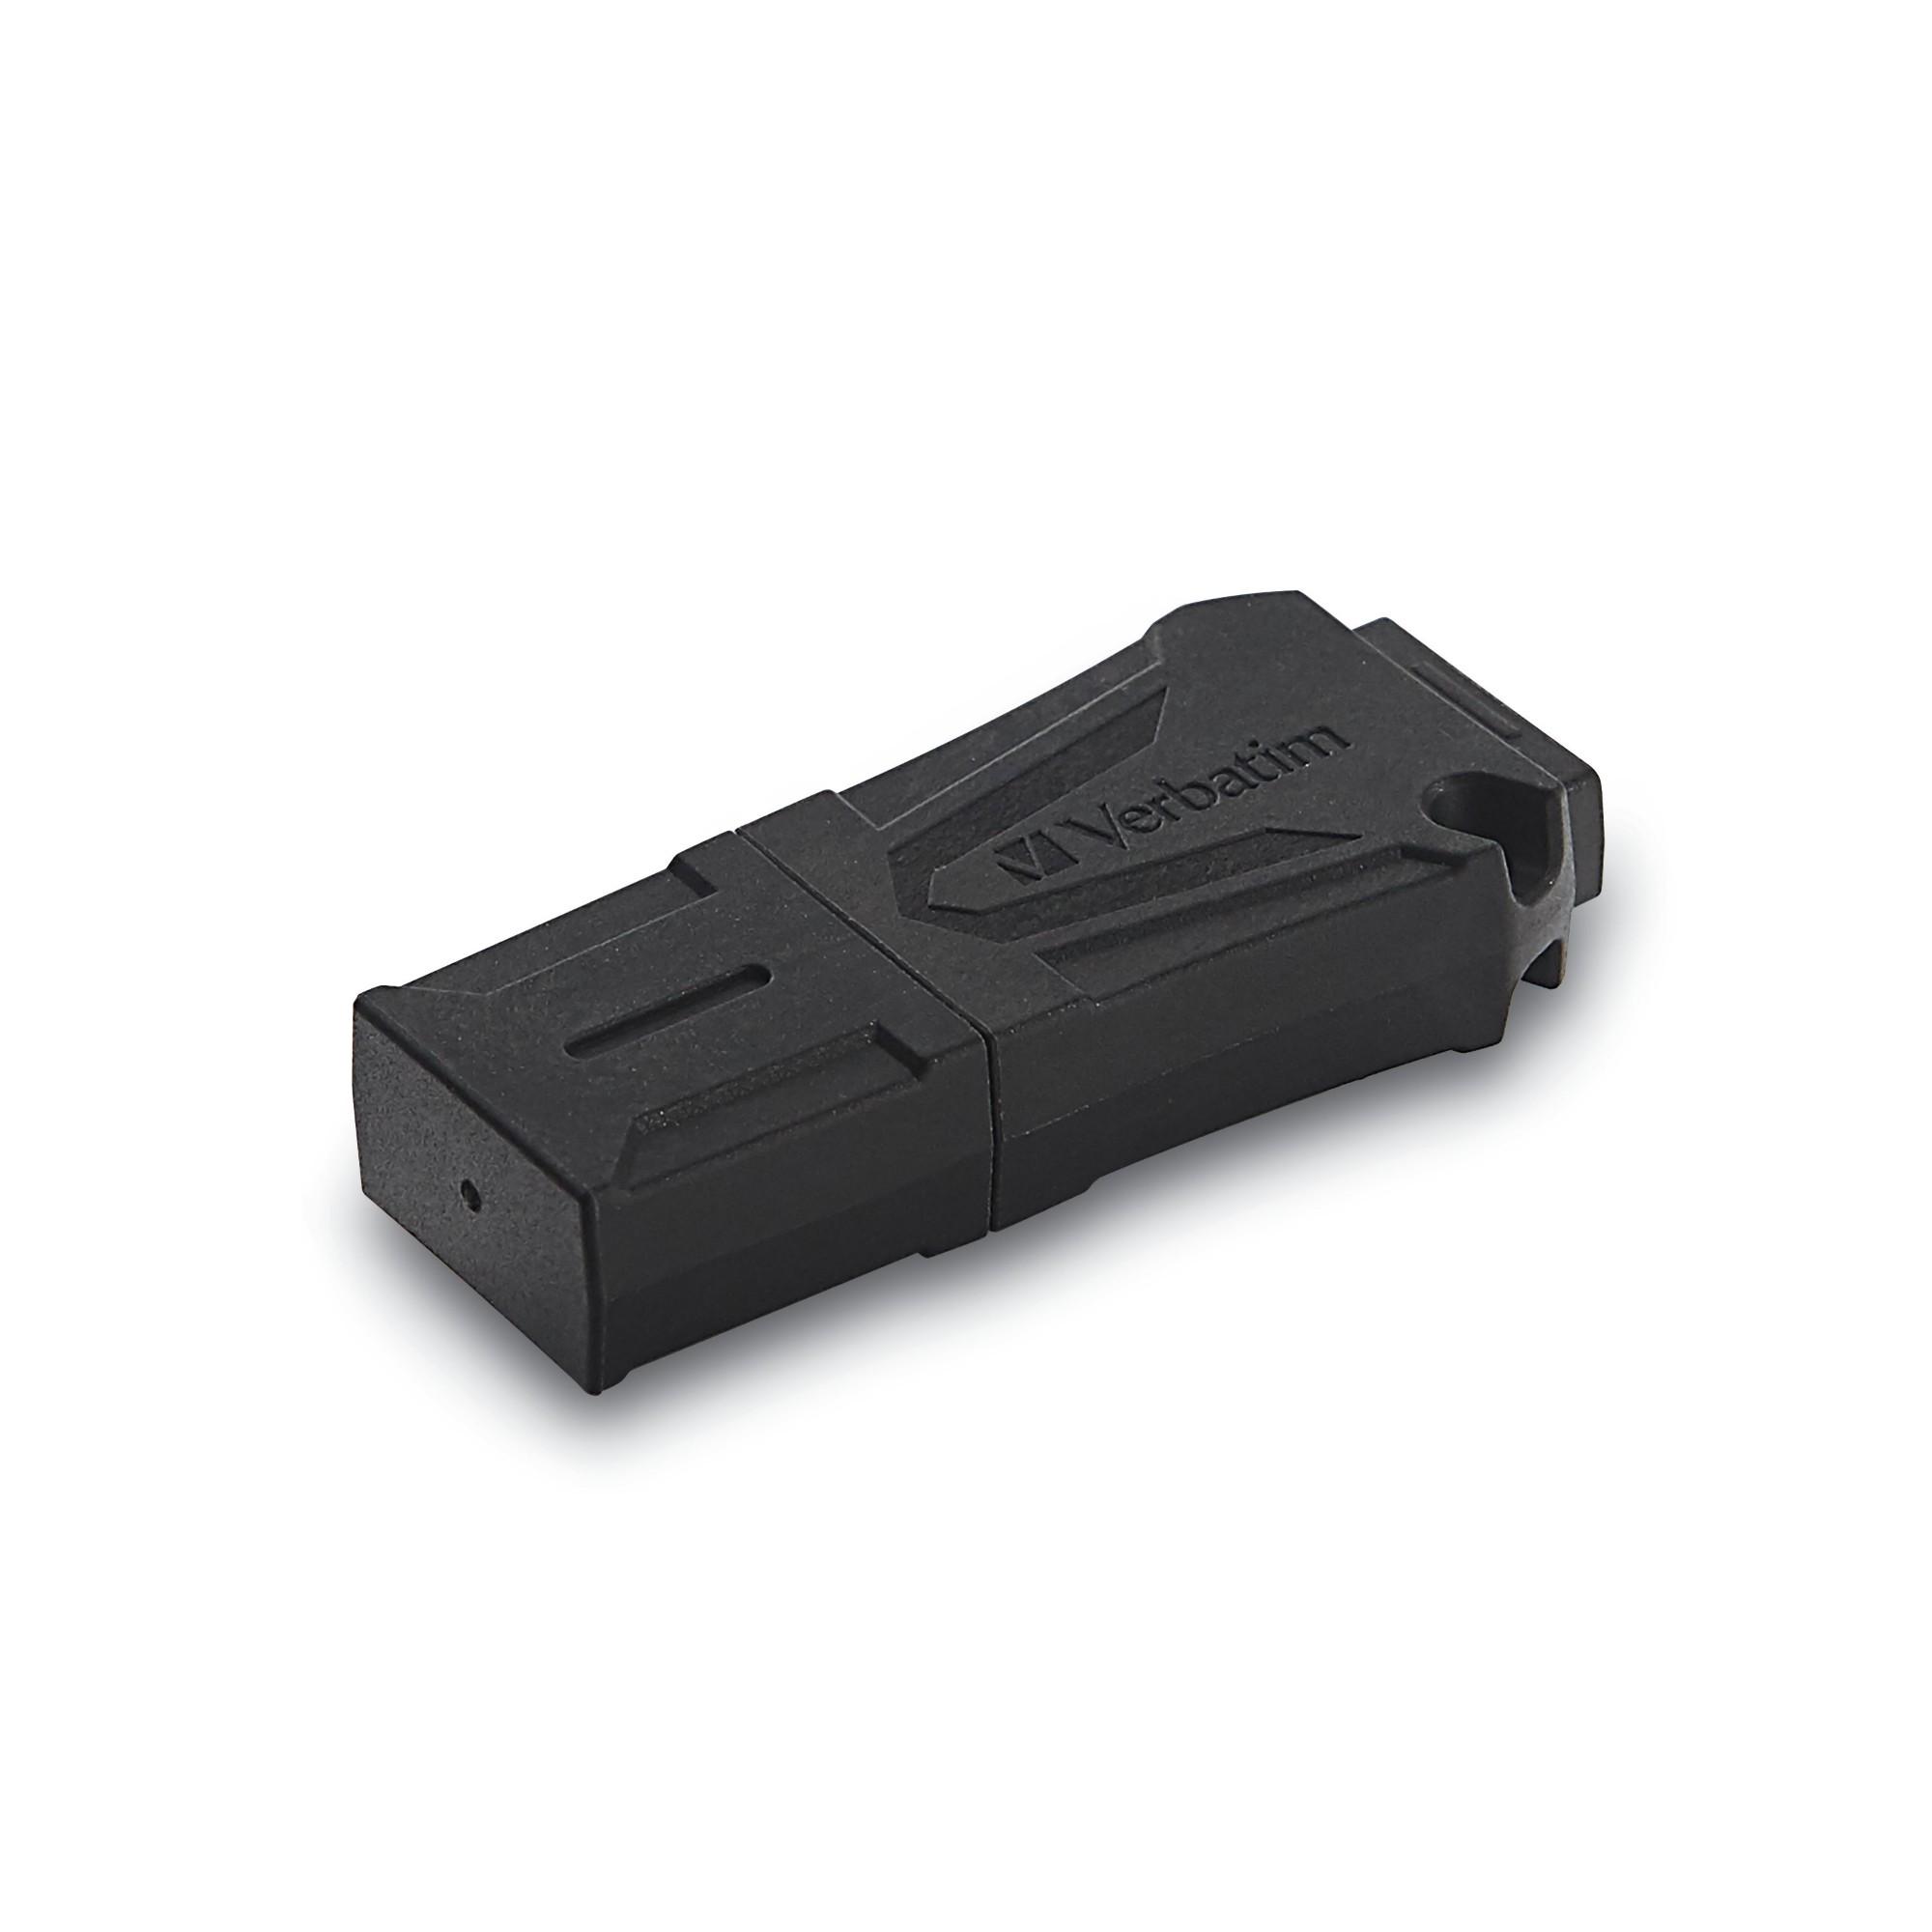 Verbatim ToughMAX USB flash drive 16 GB USB Type-A 2.0 Black